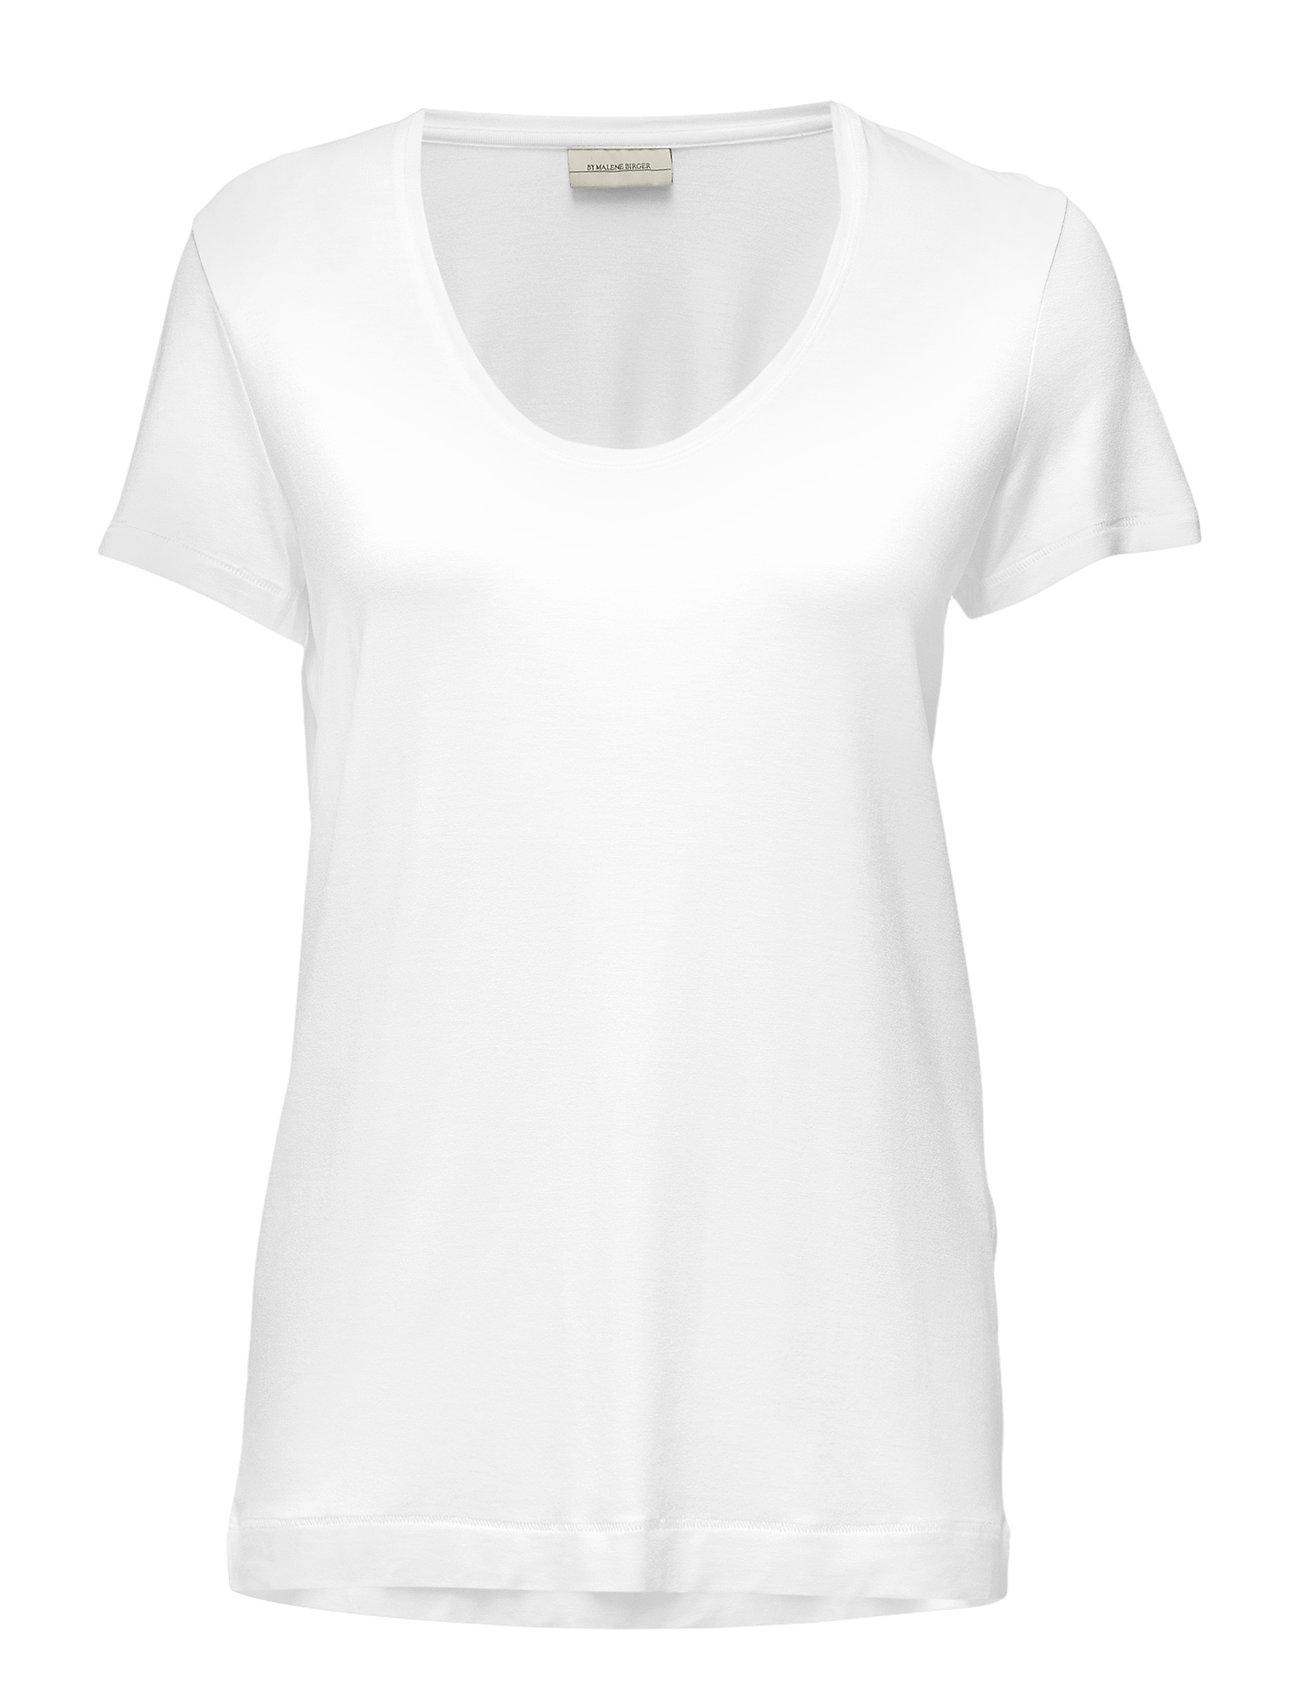 Image of Fevia T-shirt Top Hvid By Malene Birger (2421321737)